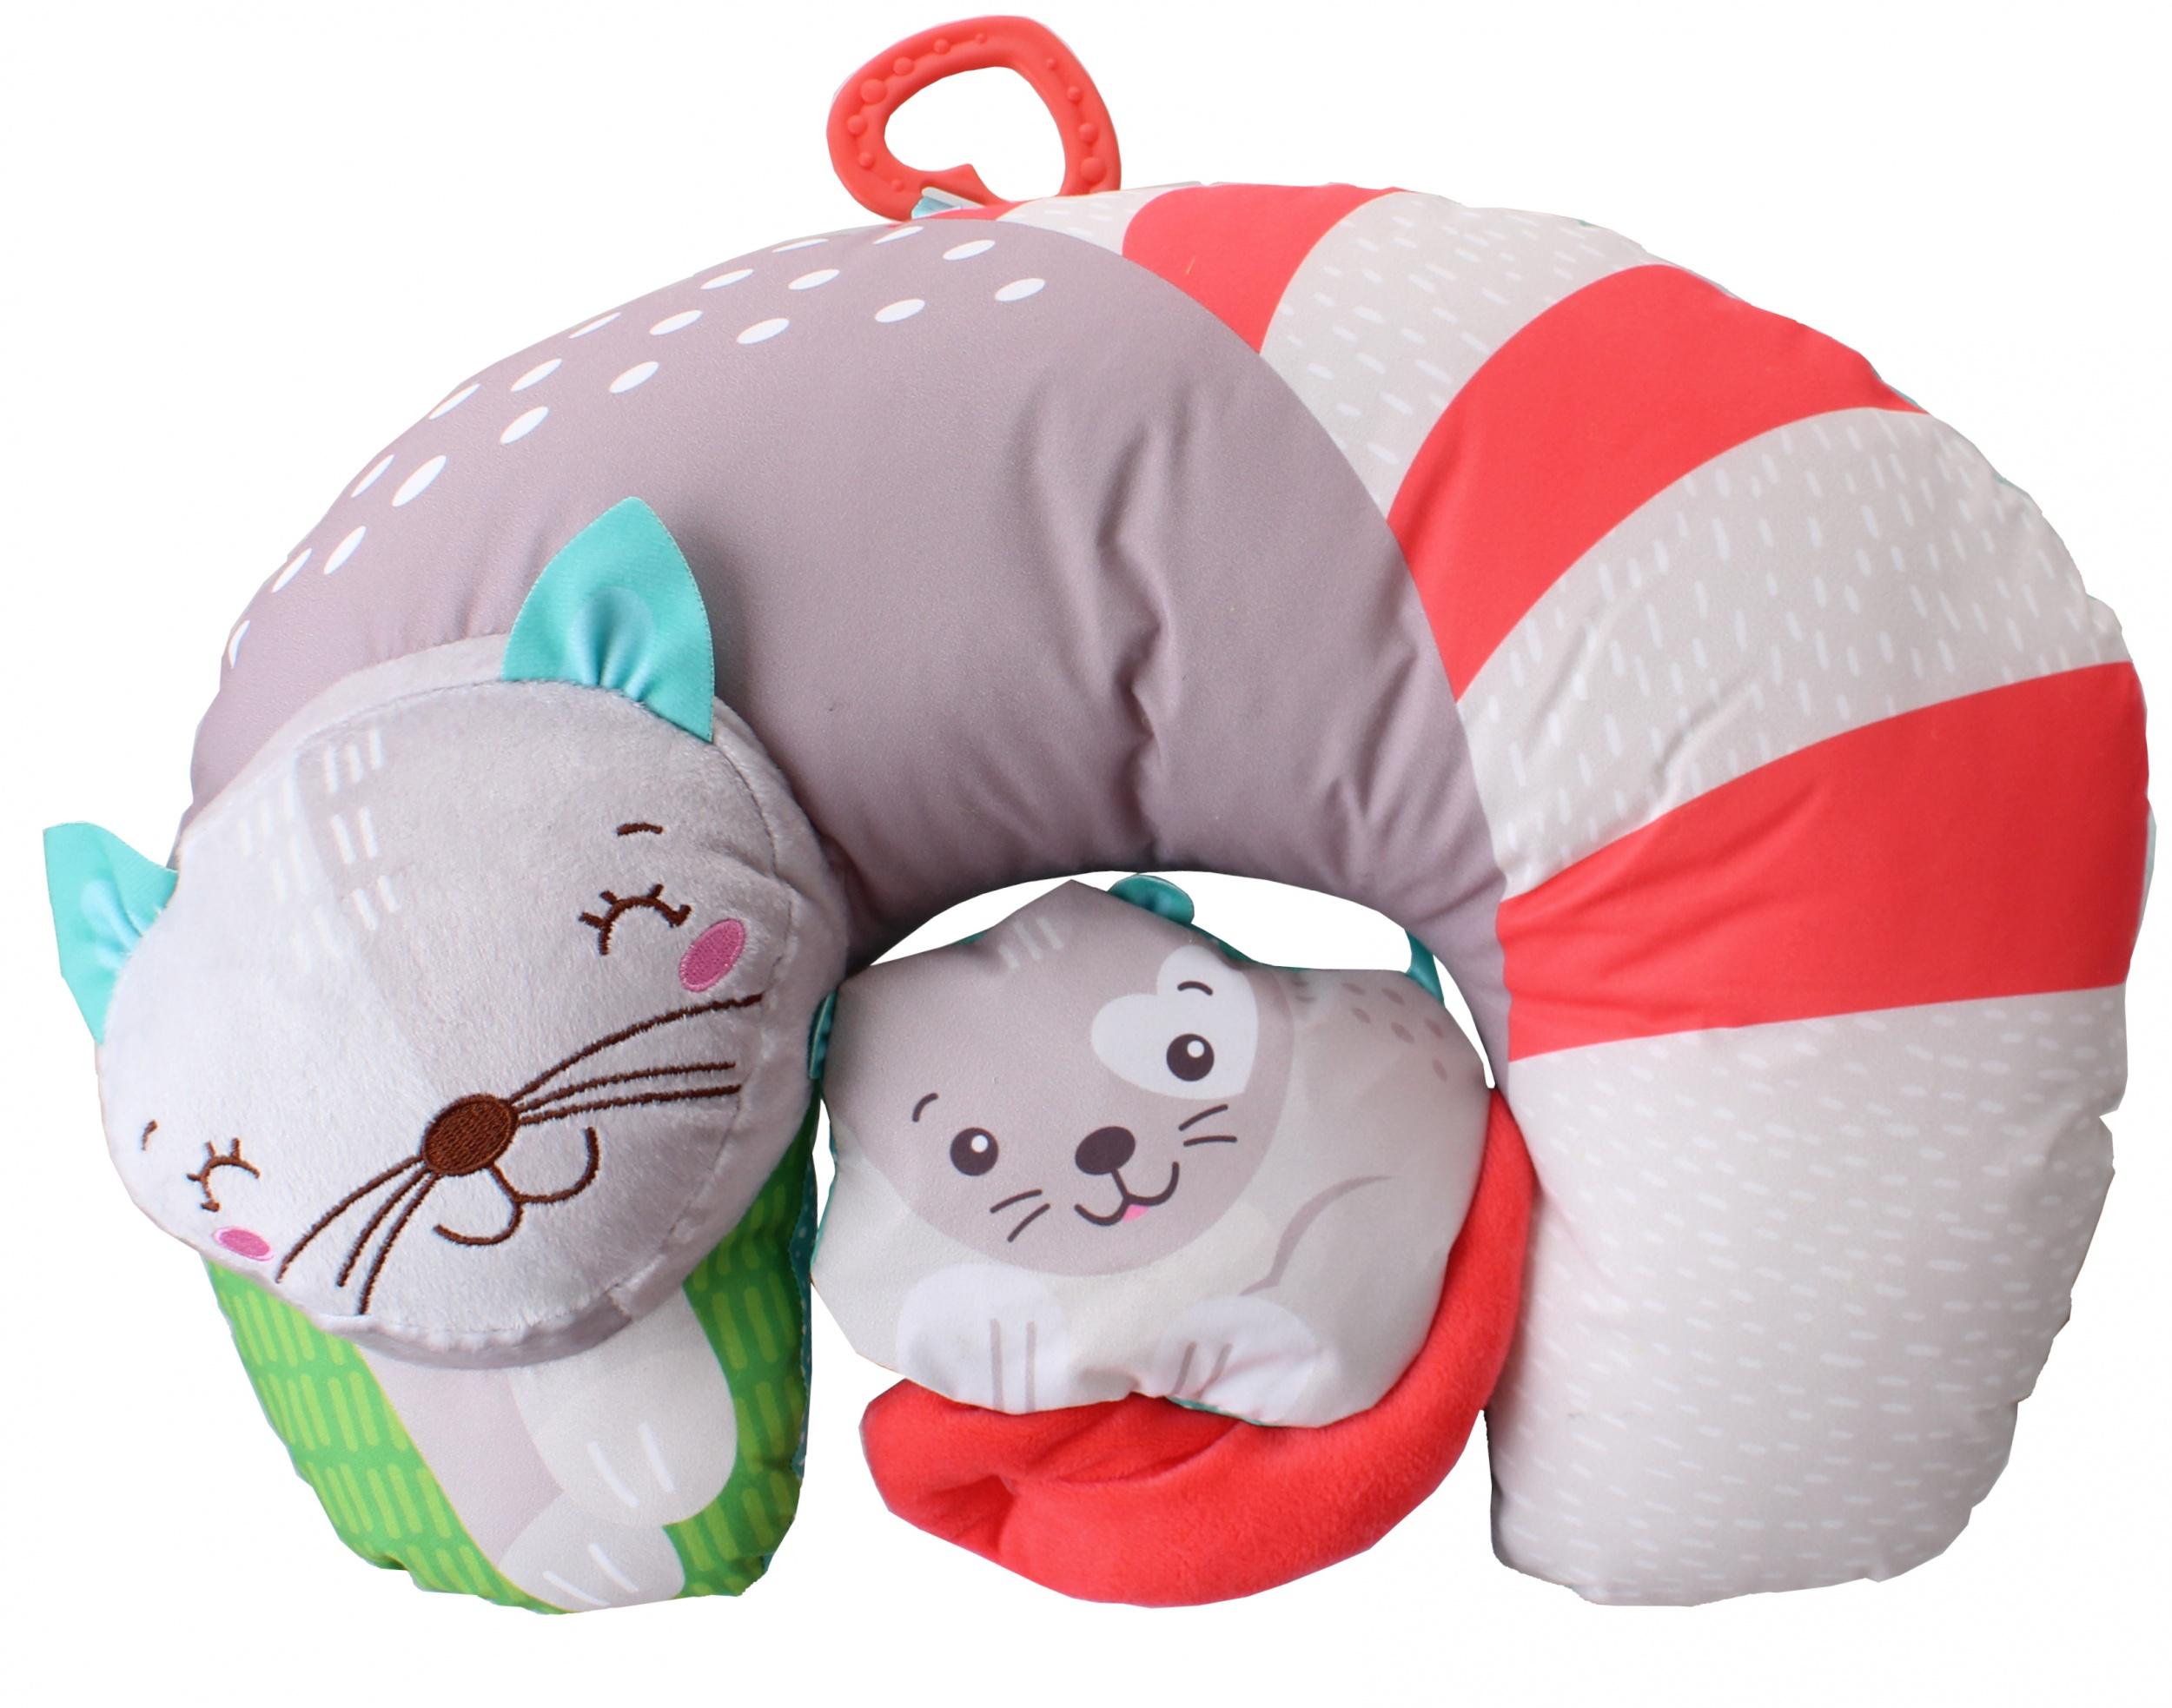 Baby Clementoni-ჩვილის ბალიში კატა